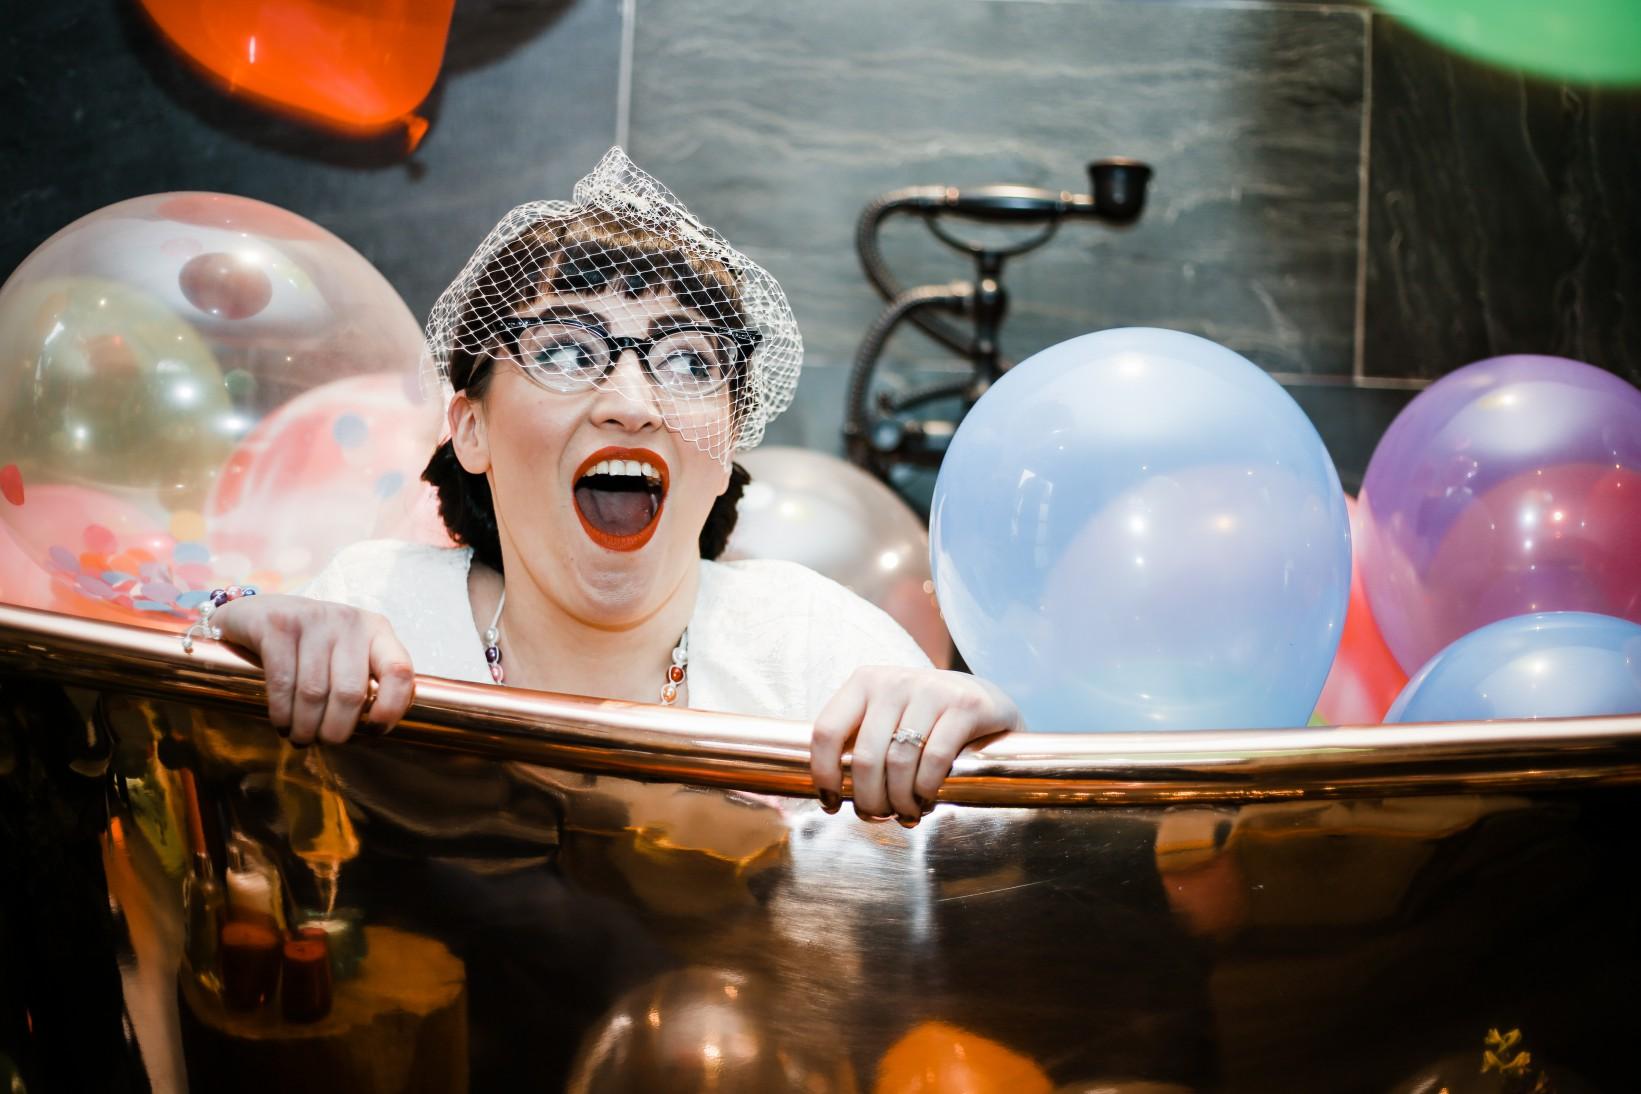 Becky Payne Photographer - Rainbow Unicorn Styled Wedding Shoot - Surprised in bath tub